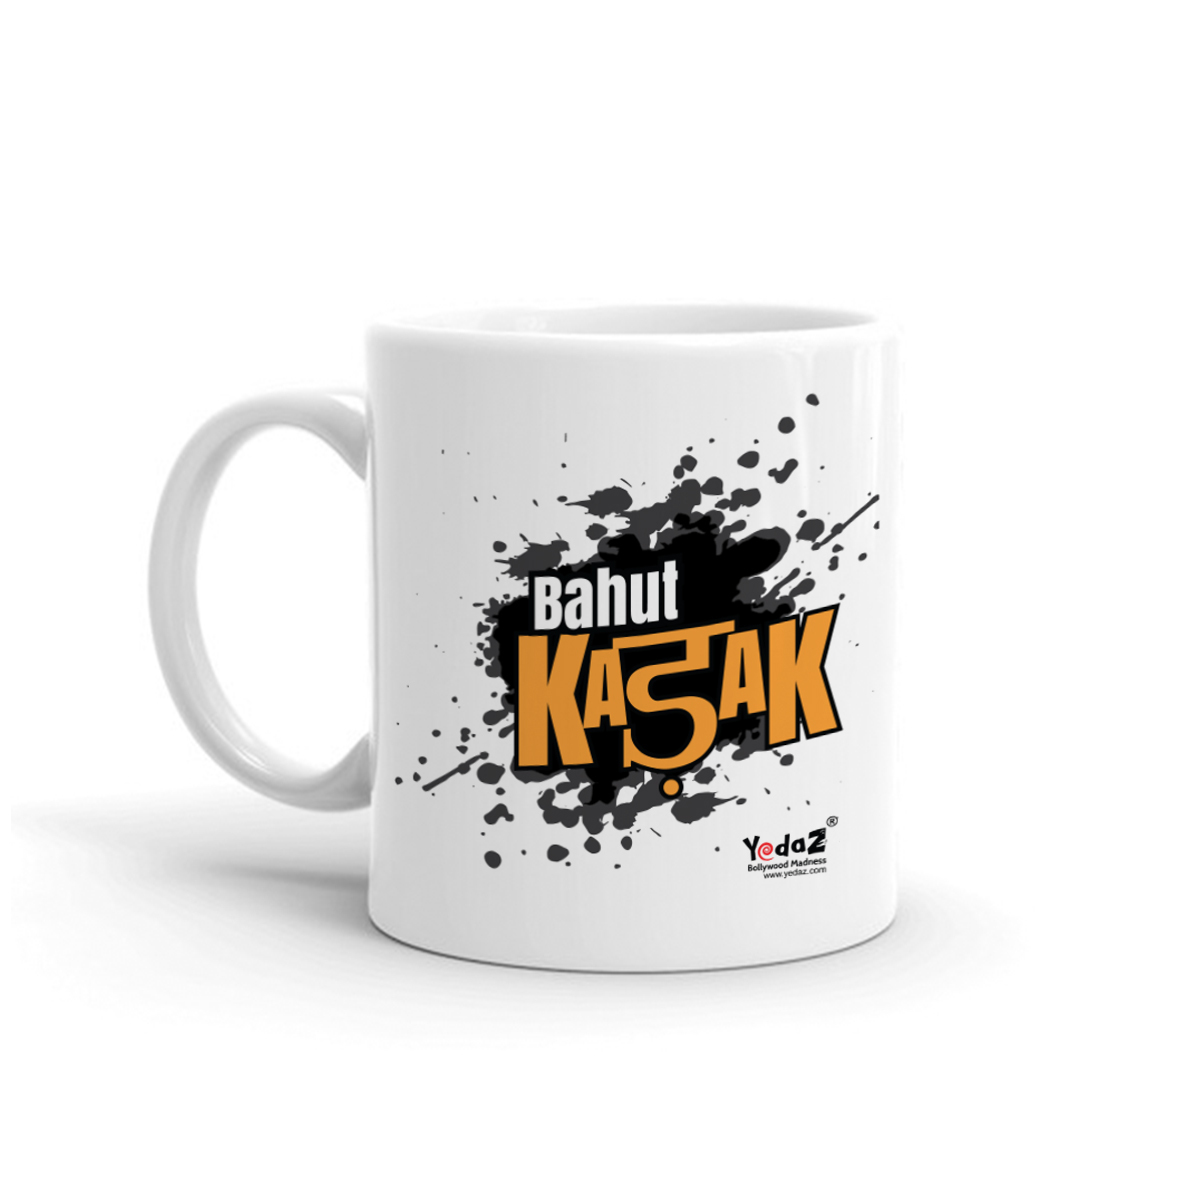 Bahut Kadak Yedaz White Ceramic Bollywood Coffee Mug | 330 m